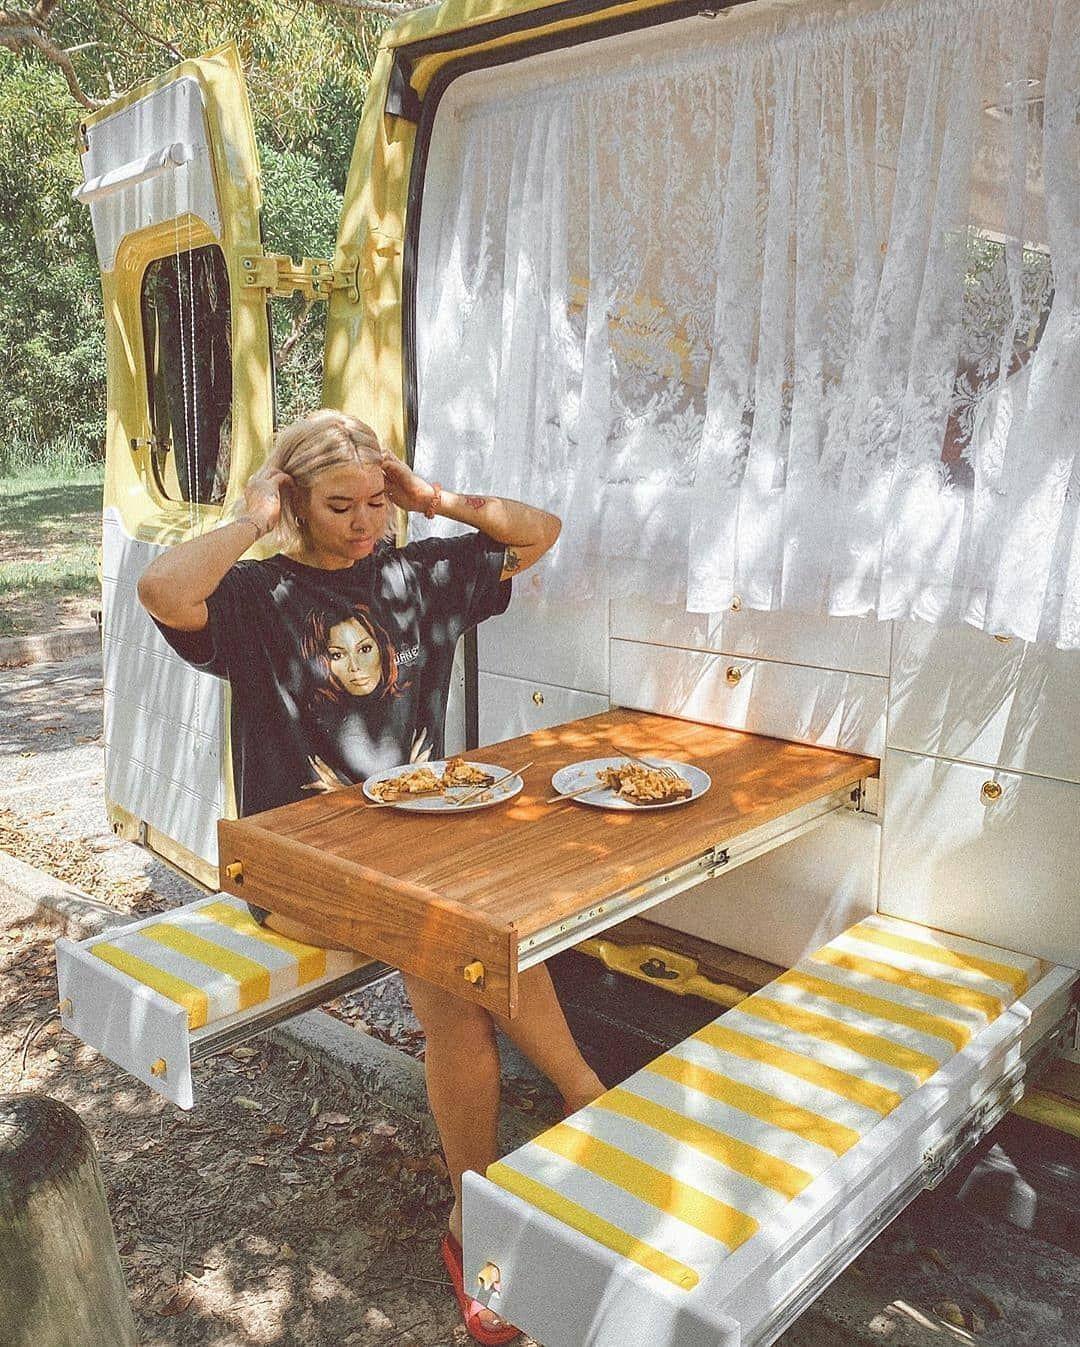 Photo of Vanlife | Wanderlust | Campers Instagram photo: Living the van life to see the w…